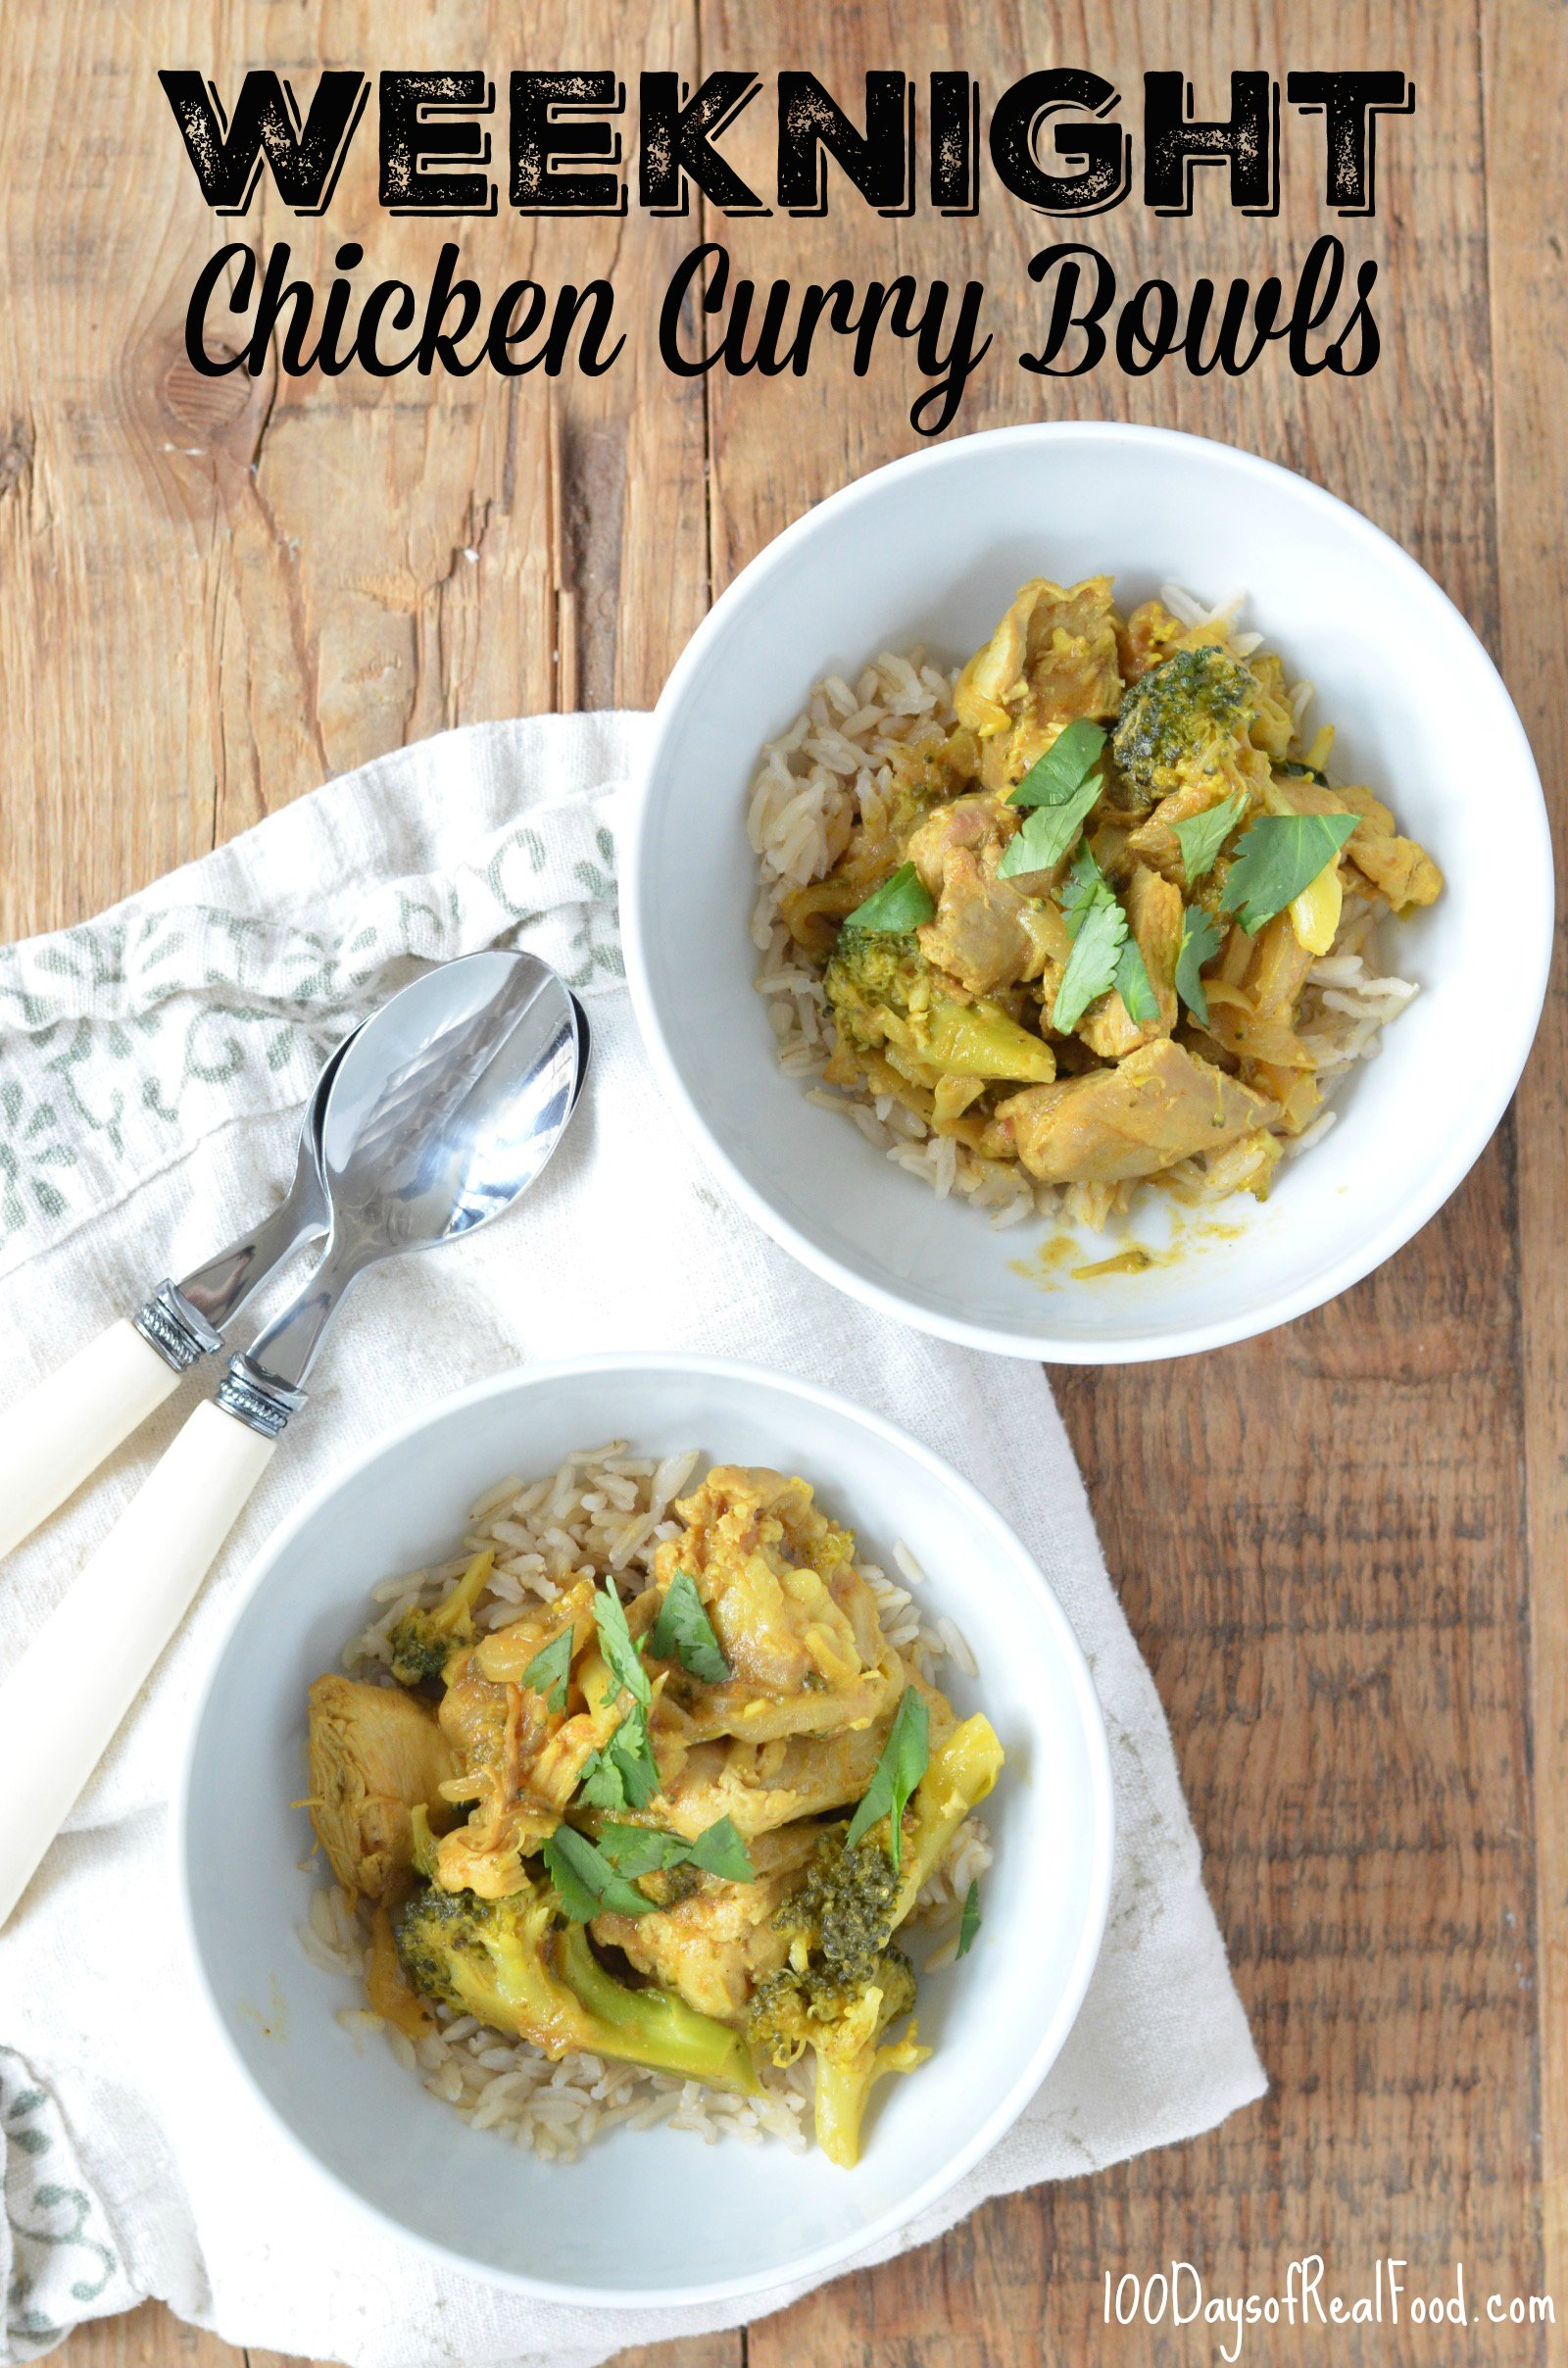 Weeknight Chicken Curry Bowls